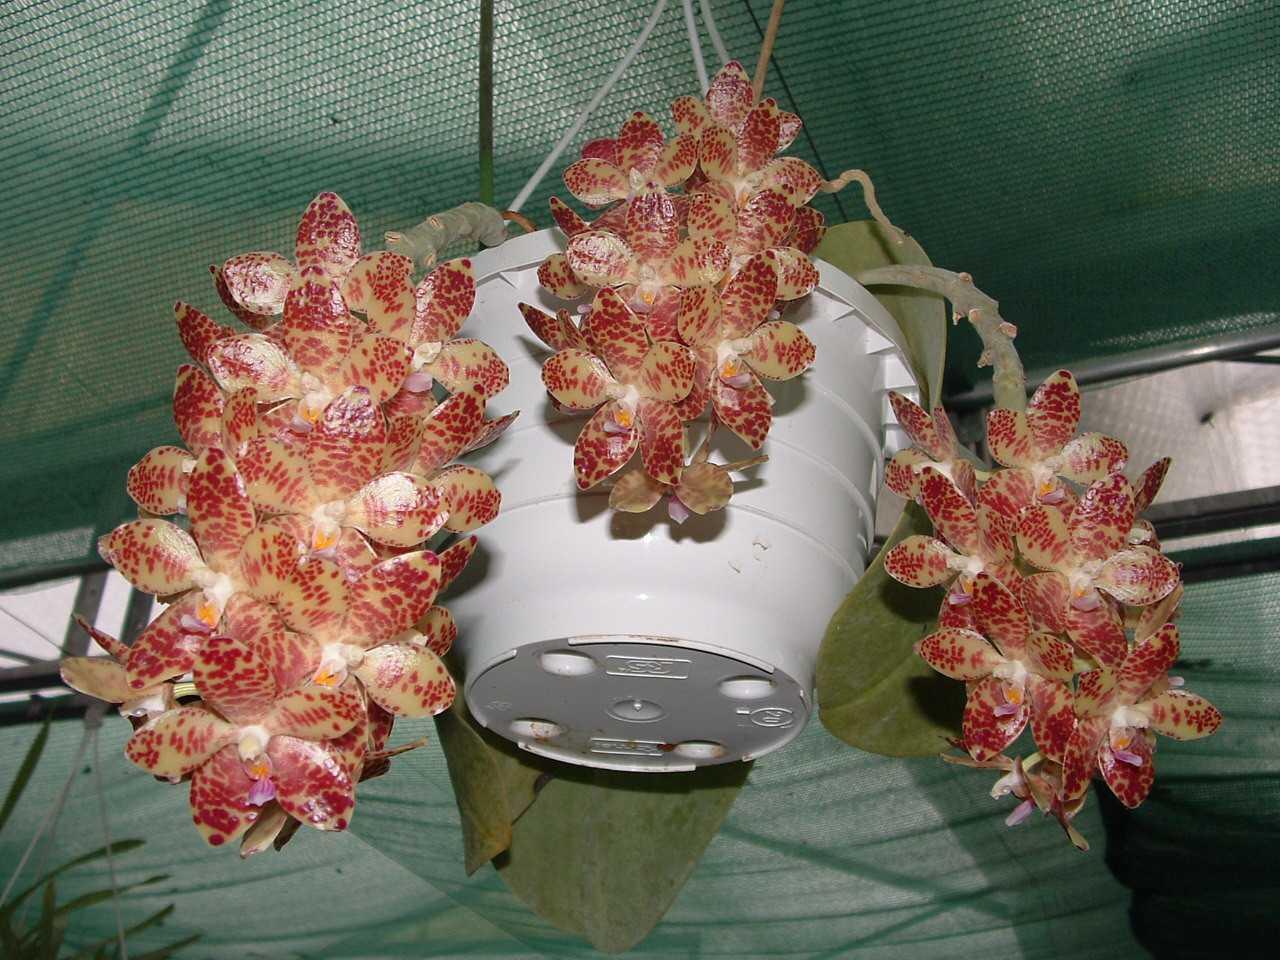 orhideya-falenopsis-foto-video-vidyi-falenopsis-harakteristika-i-opisanie-1